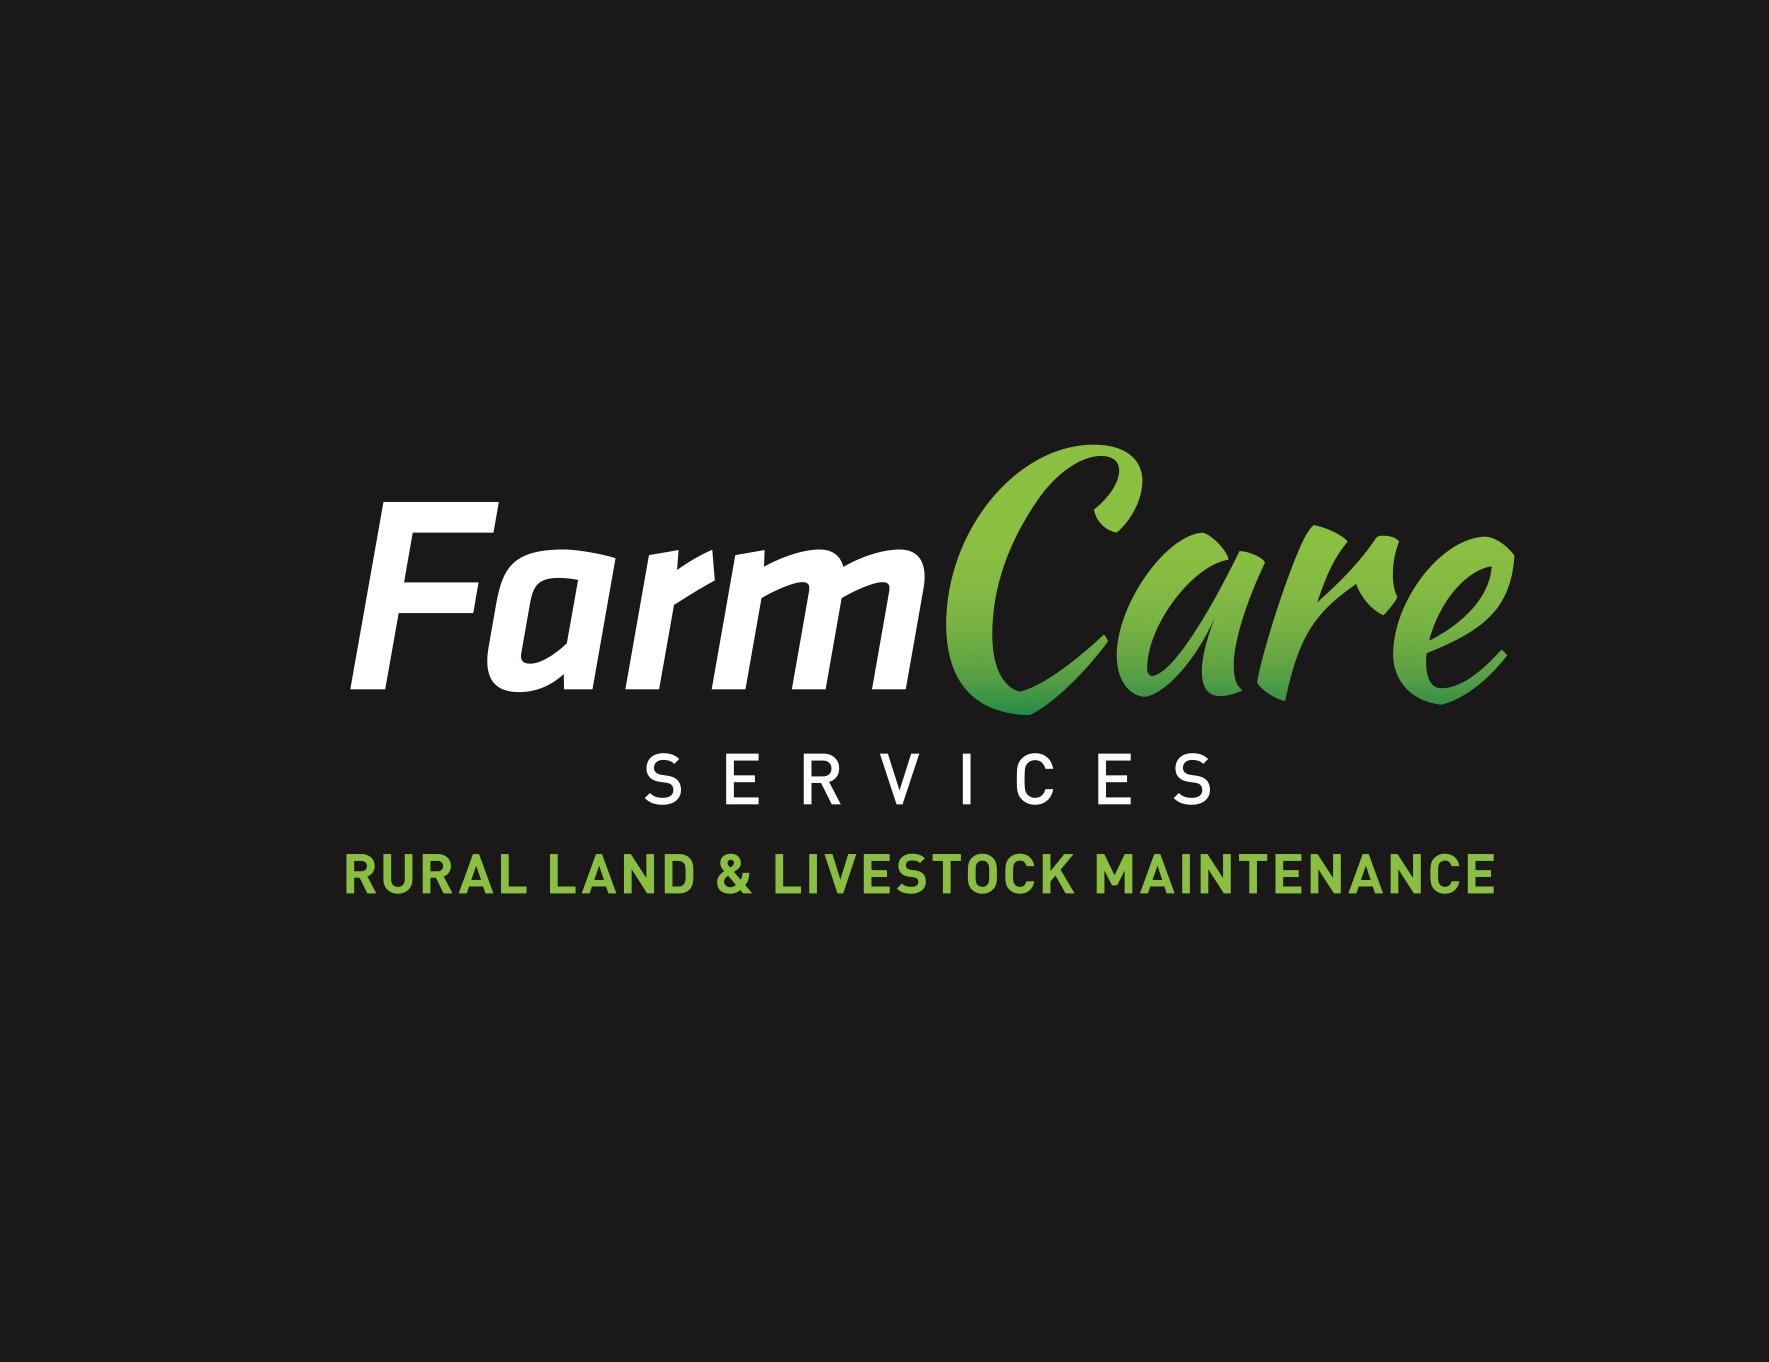 Farm Care Services Limited